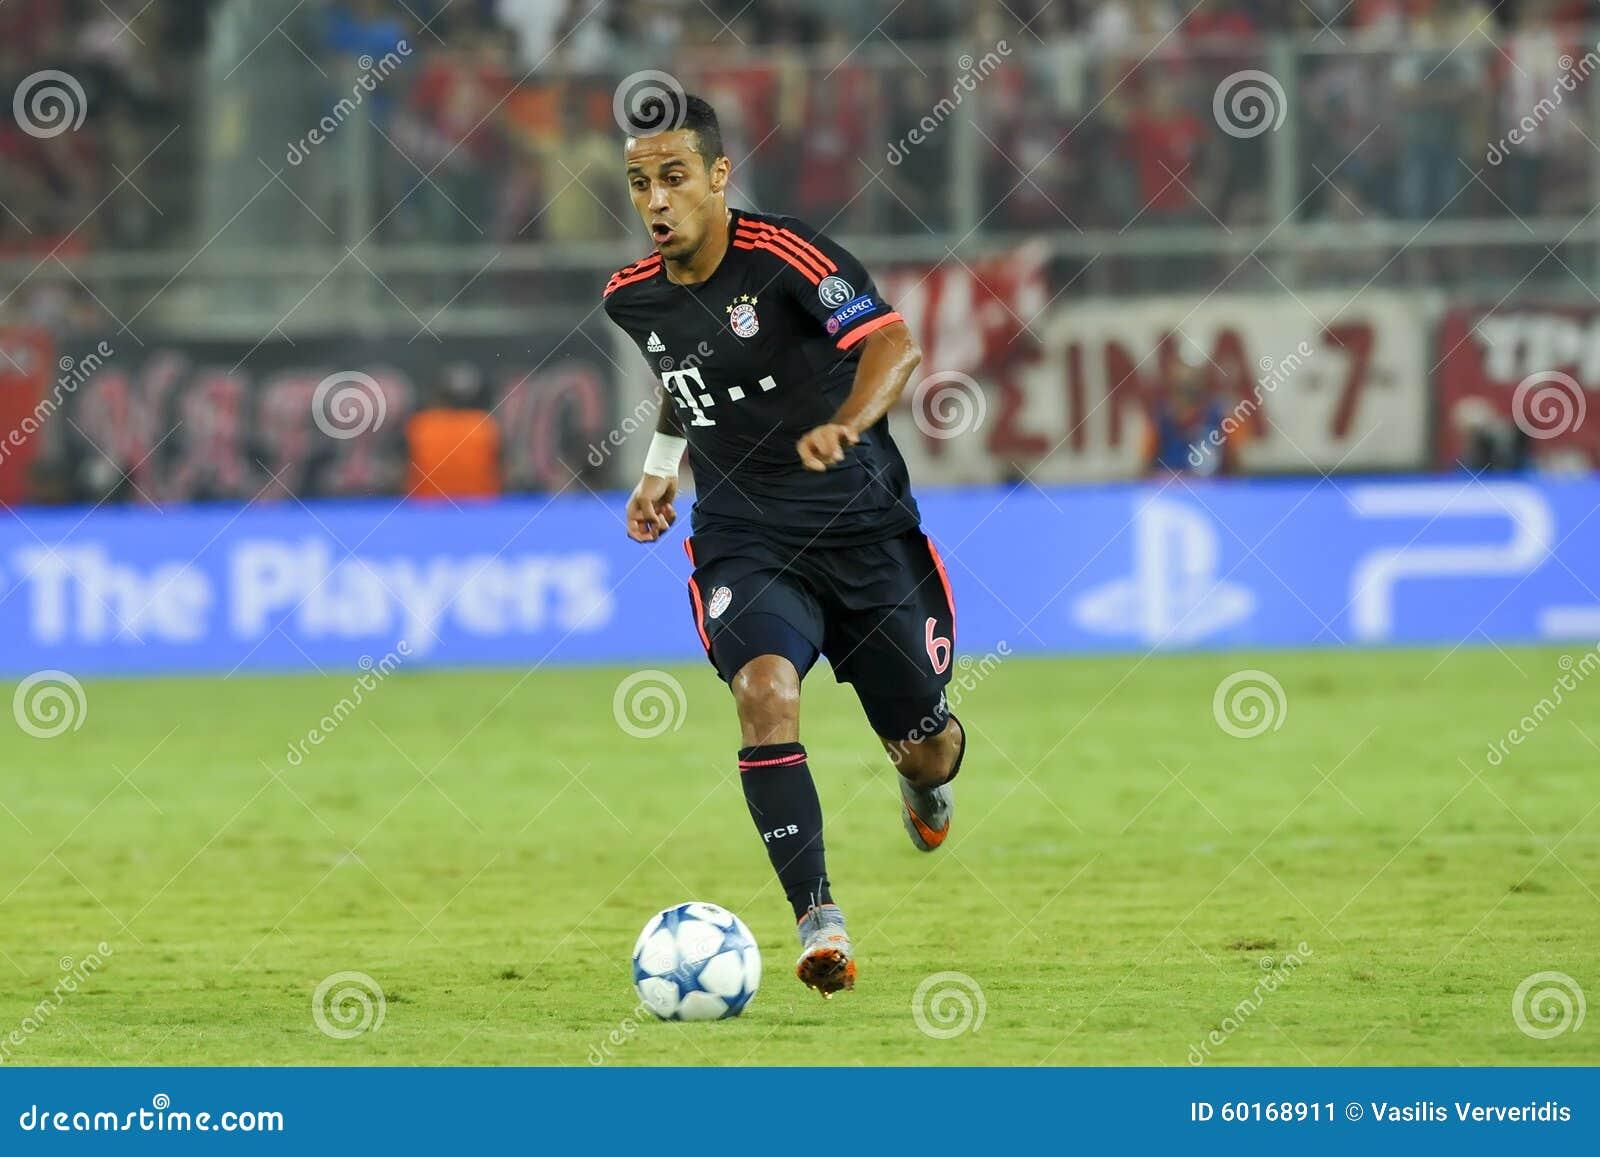 Thiago Alcantara during the UEFA Champions League game between O